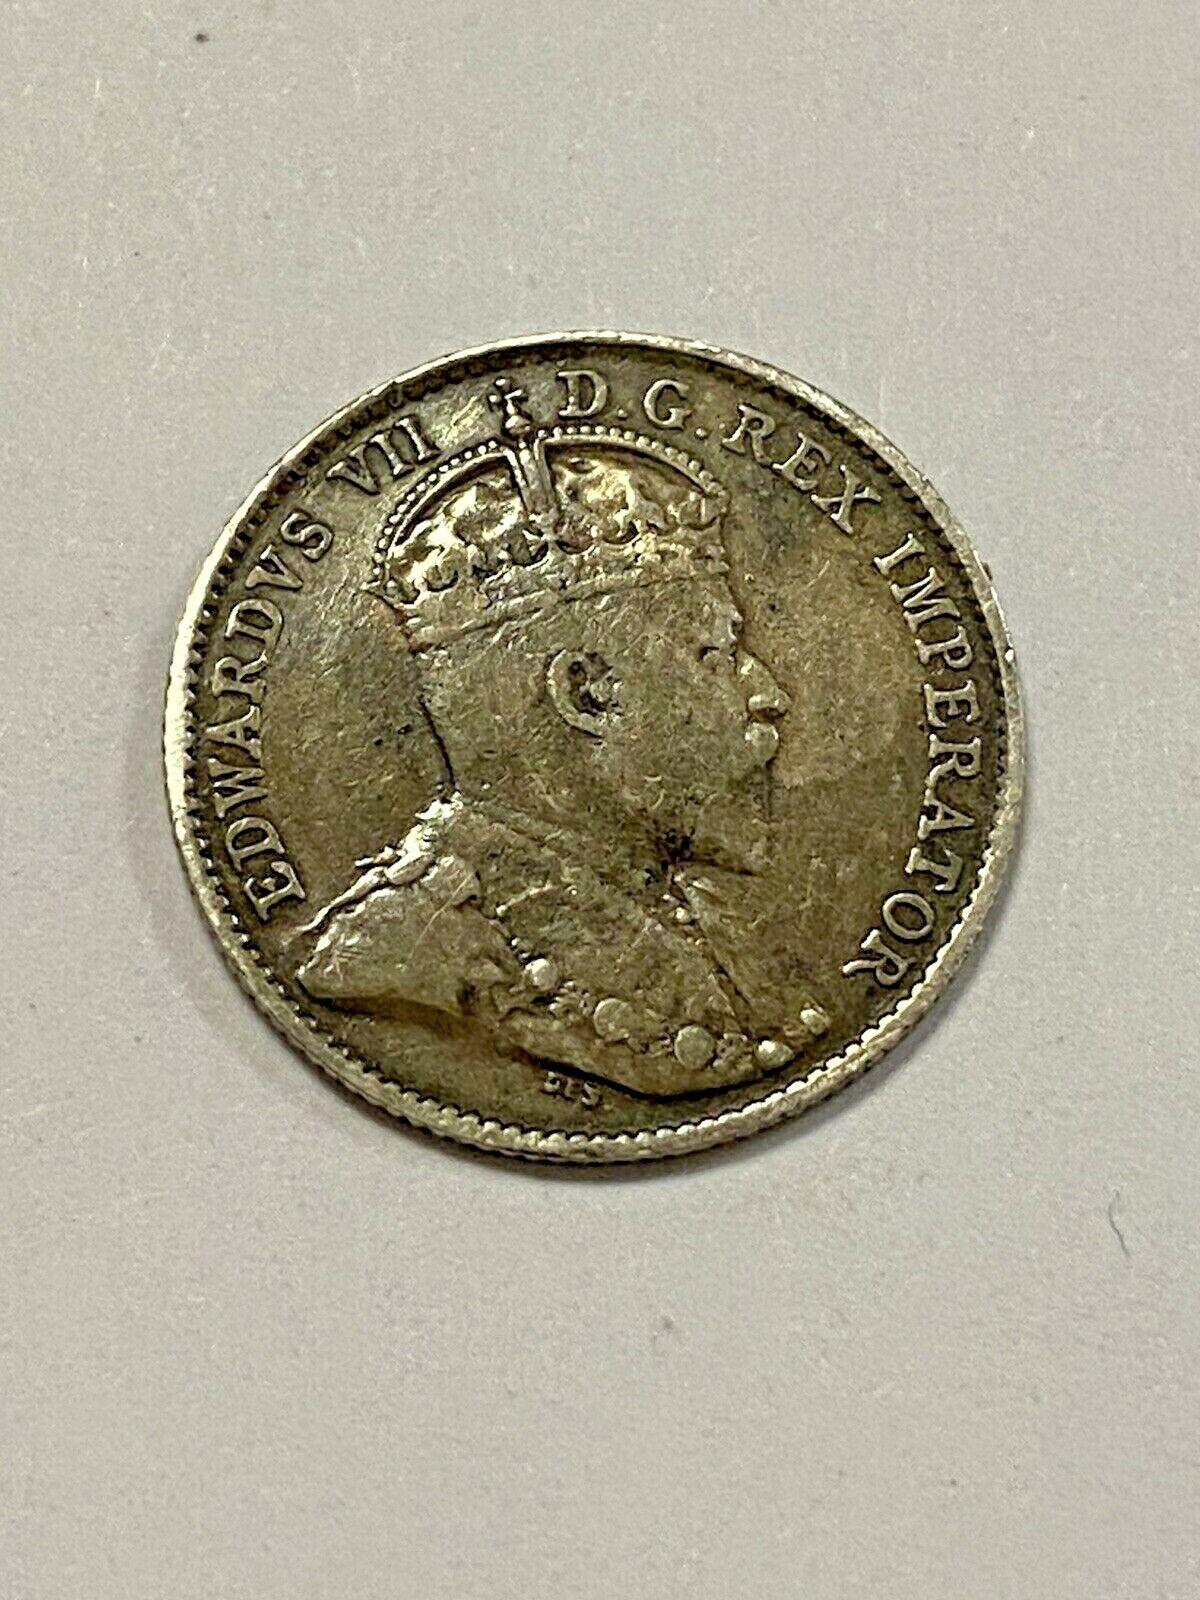 Canada 1910 5 Cent coin, Cross, HL, Very Slight Bend